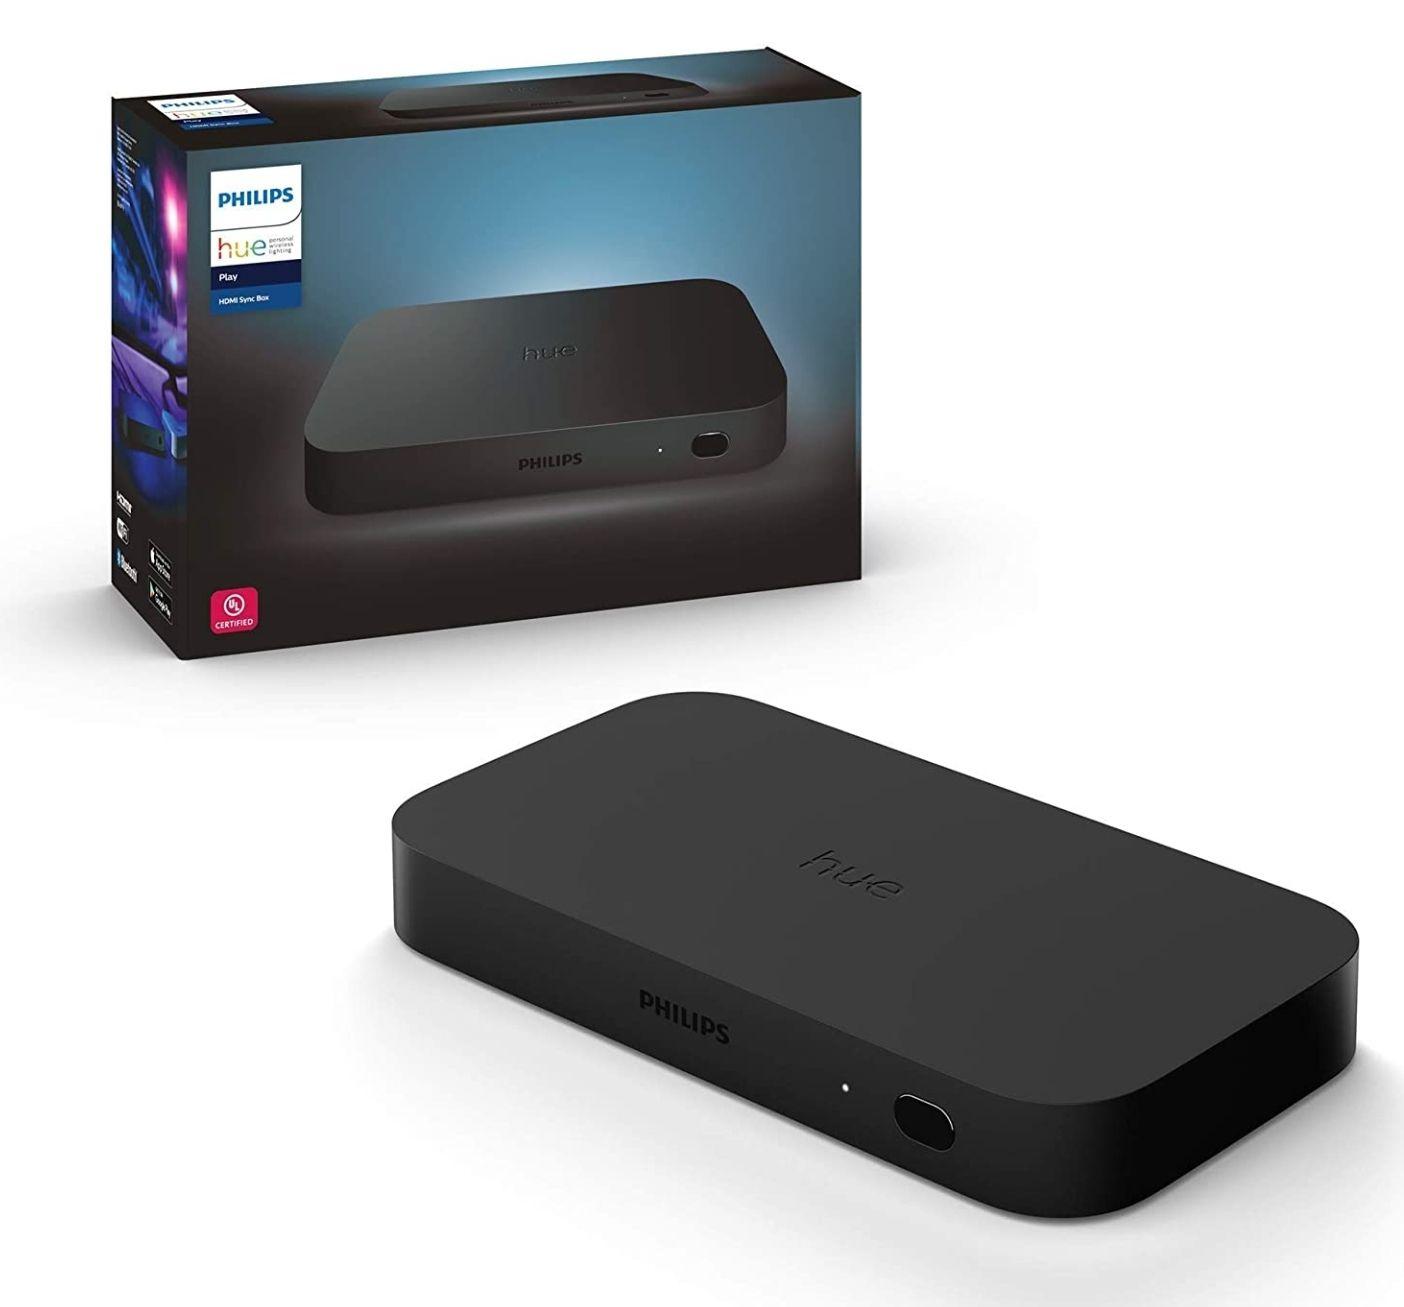 Amazon: PHILIPS Hue Sync Box - Sistema HDMI para sincronizar Entretenimiento con iluminación Hue